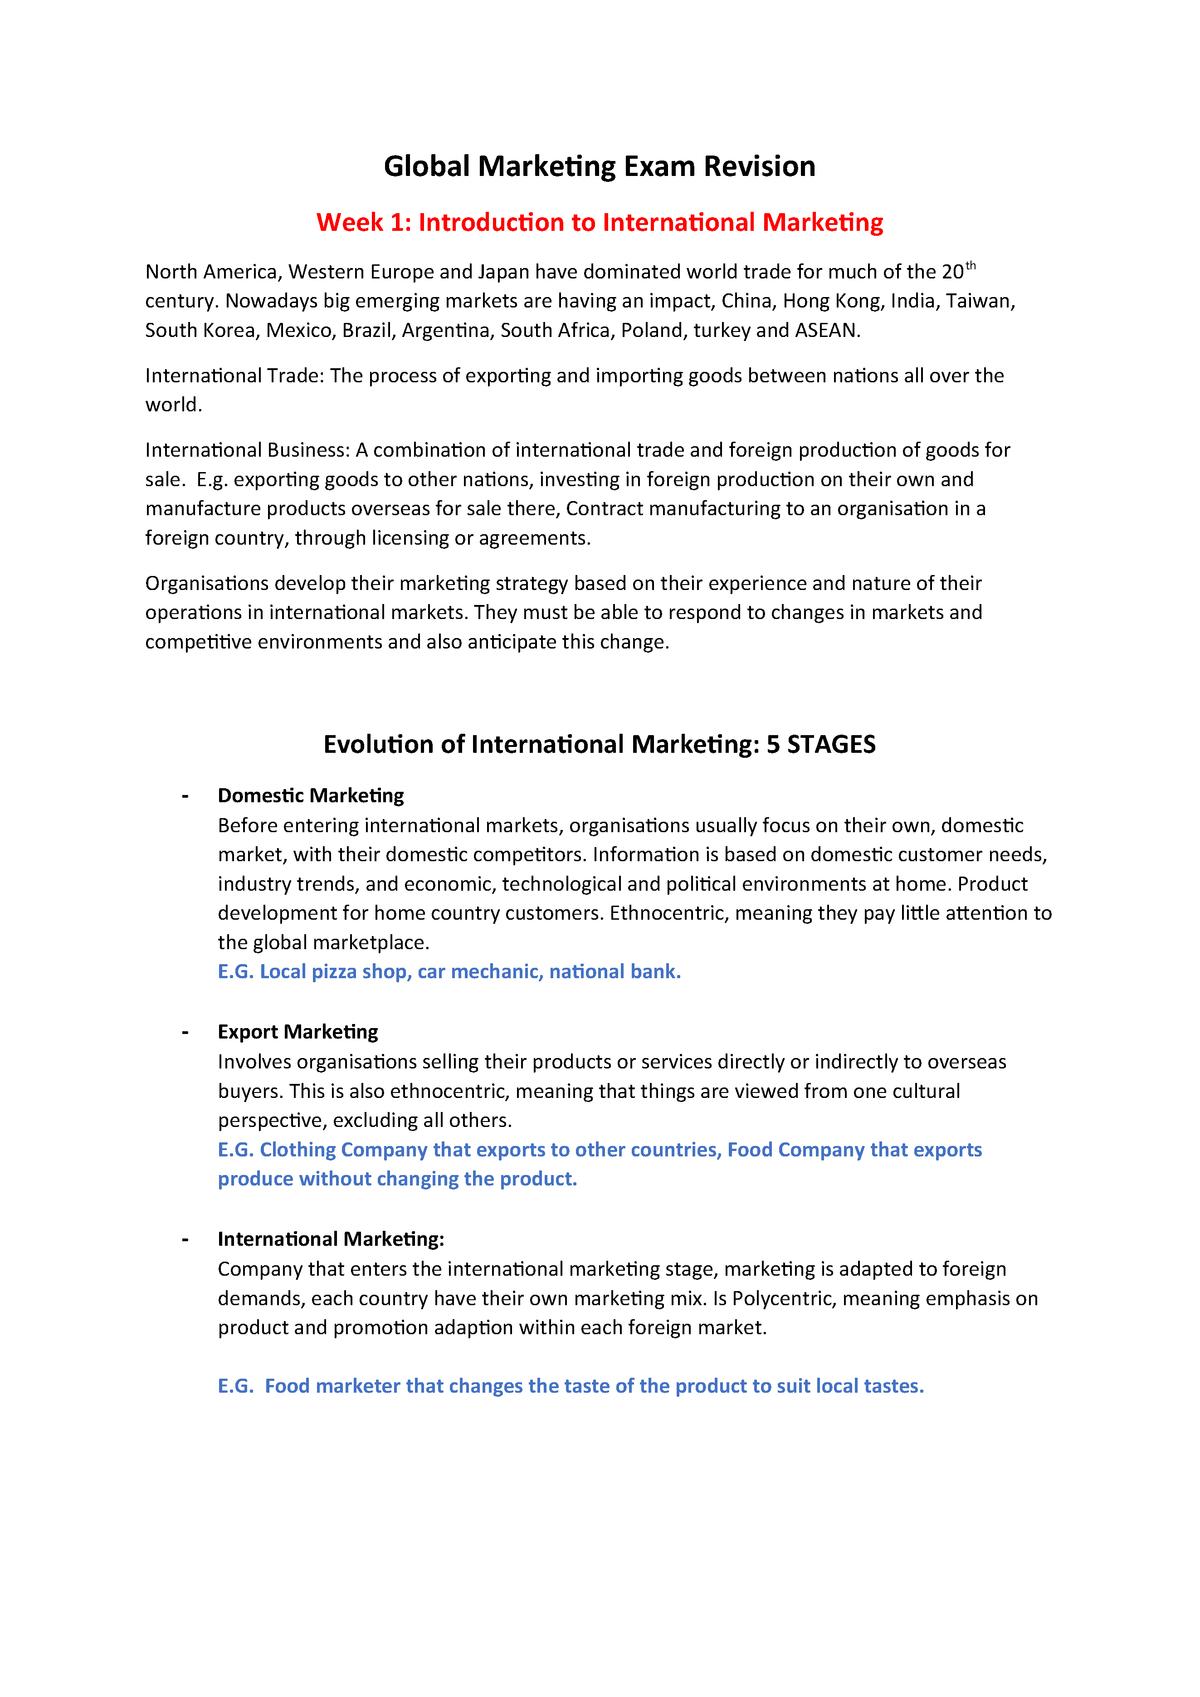 Global Marketing Exam Revision - MKTG1061: Global Marketing